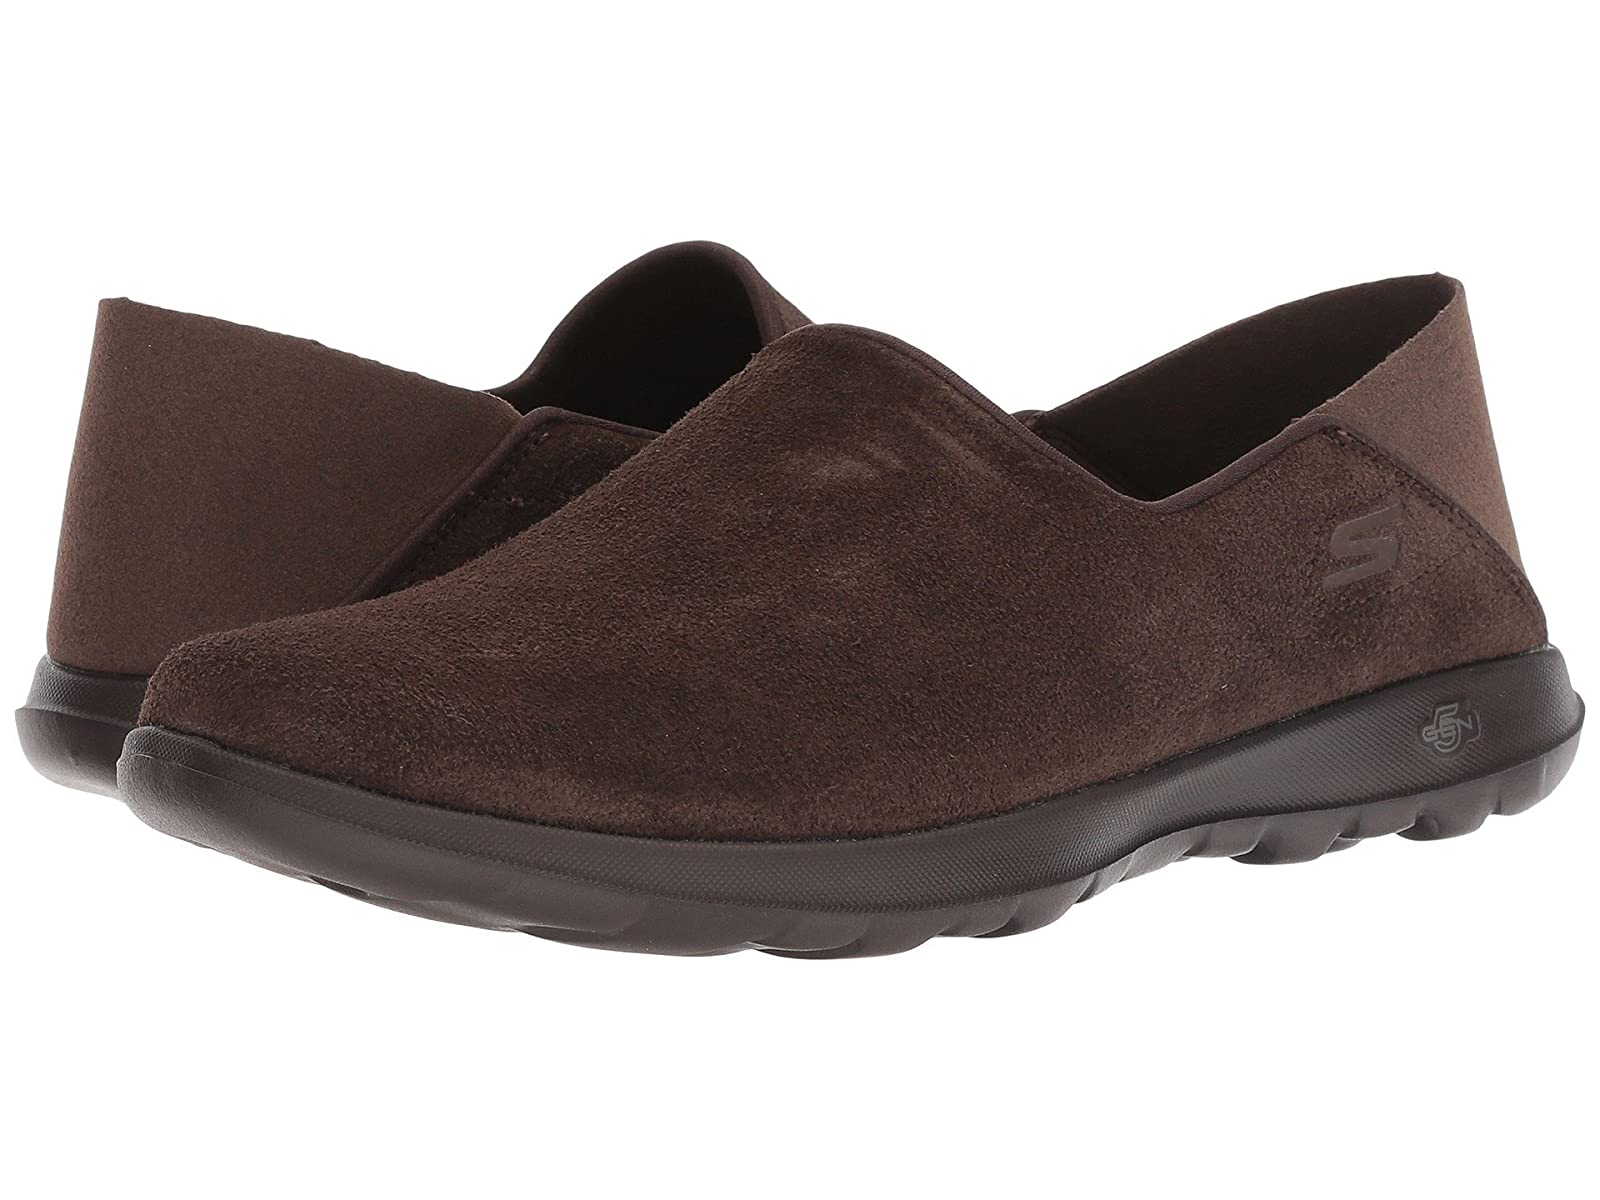 SKECHERS Performance Go Walk Lite CozyCheap and distinctive eye-catching shoes